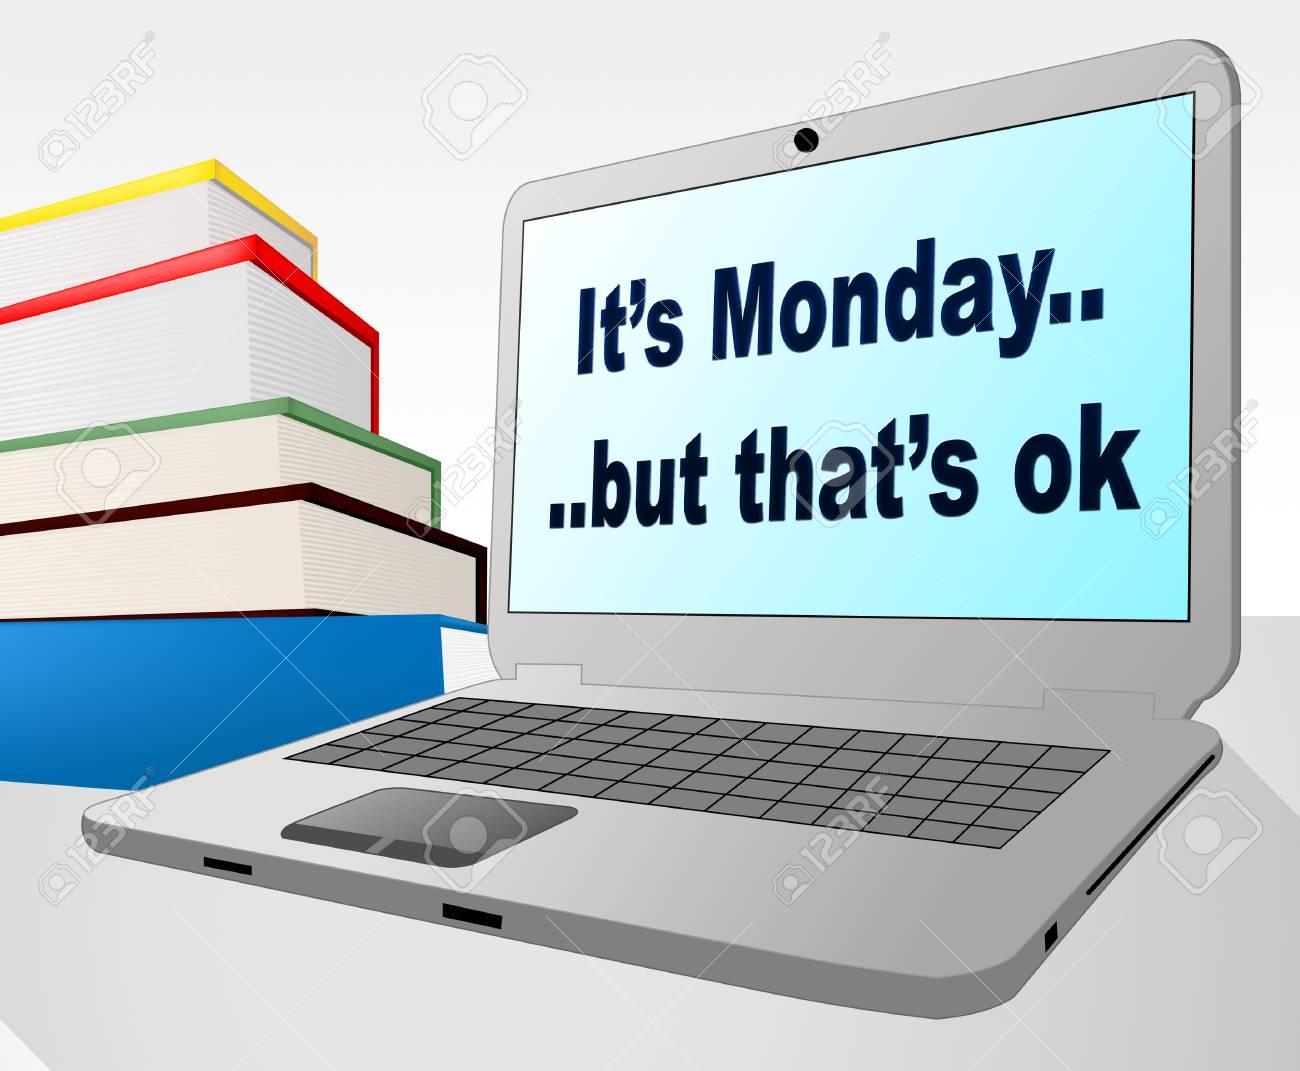 Happy Monday Quotes Its Ok Laptop Computer 3d Illustration